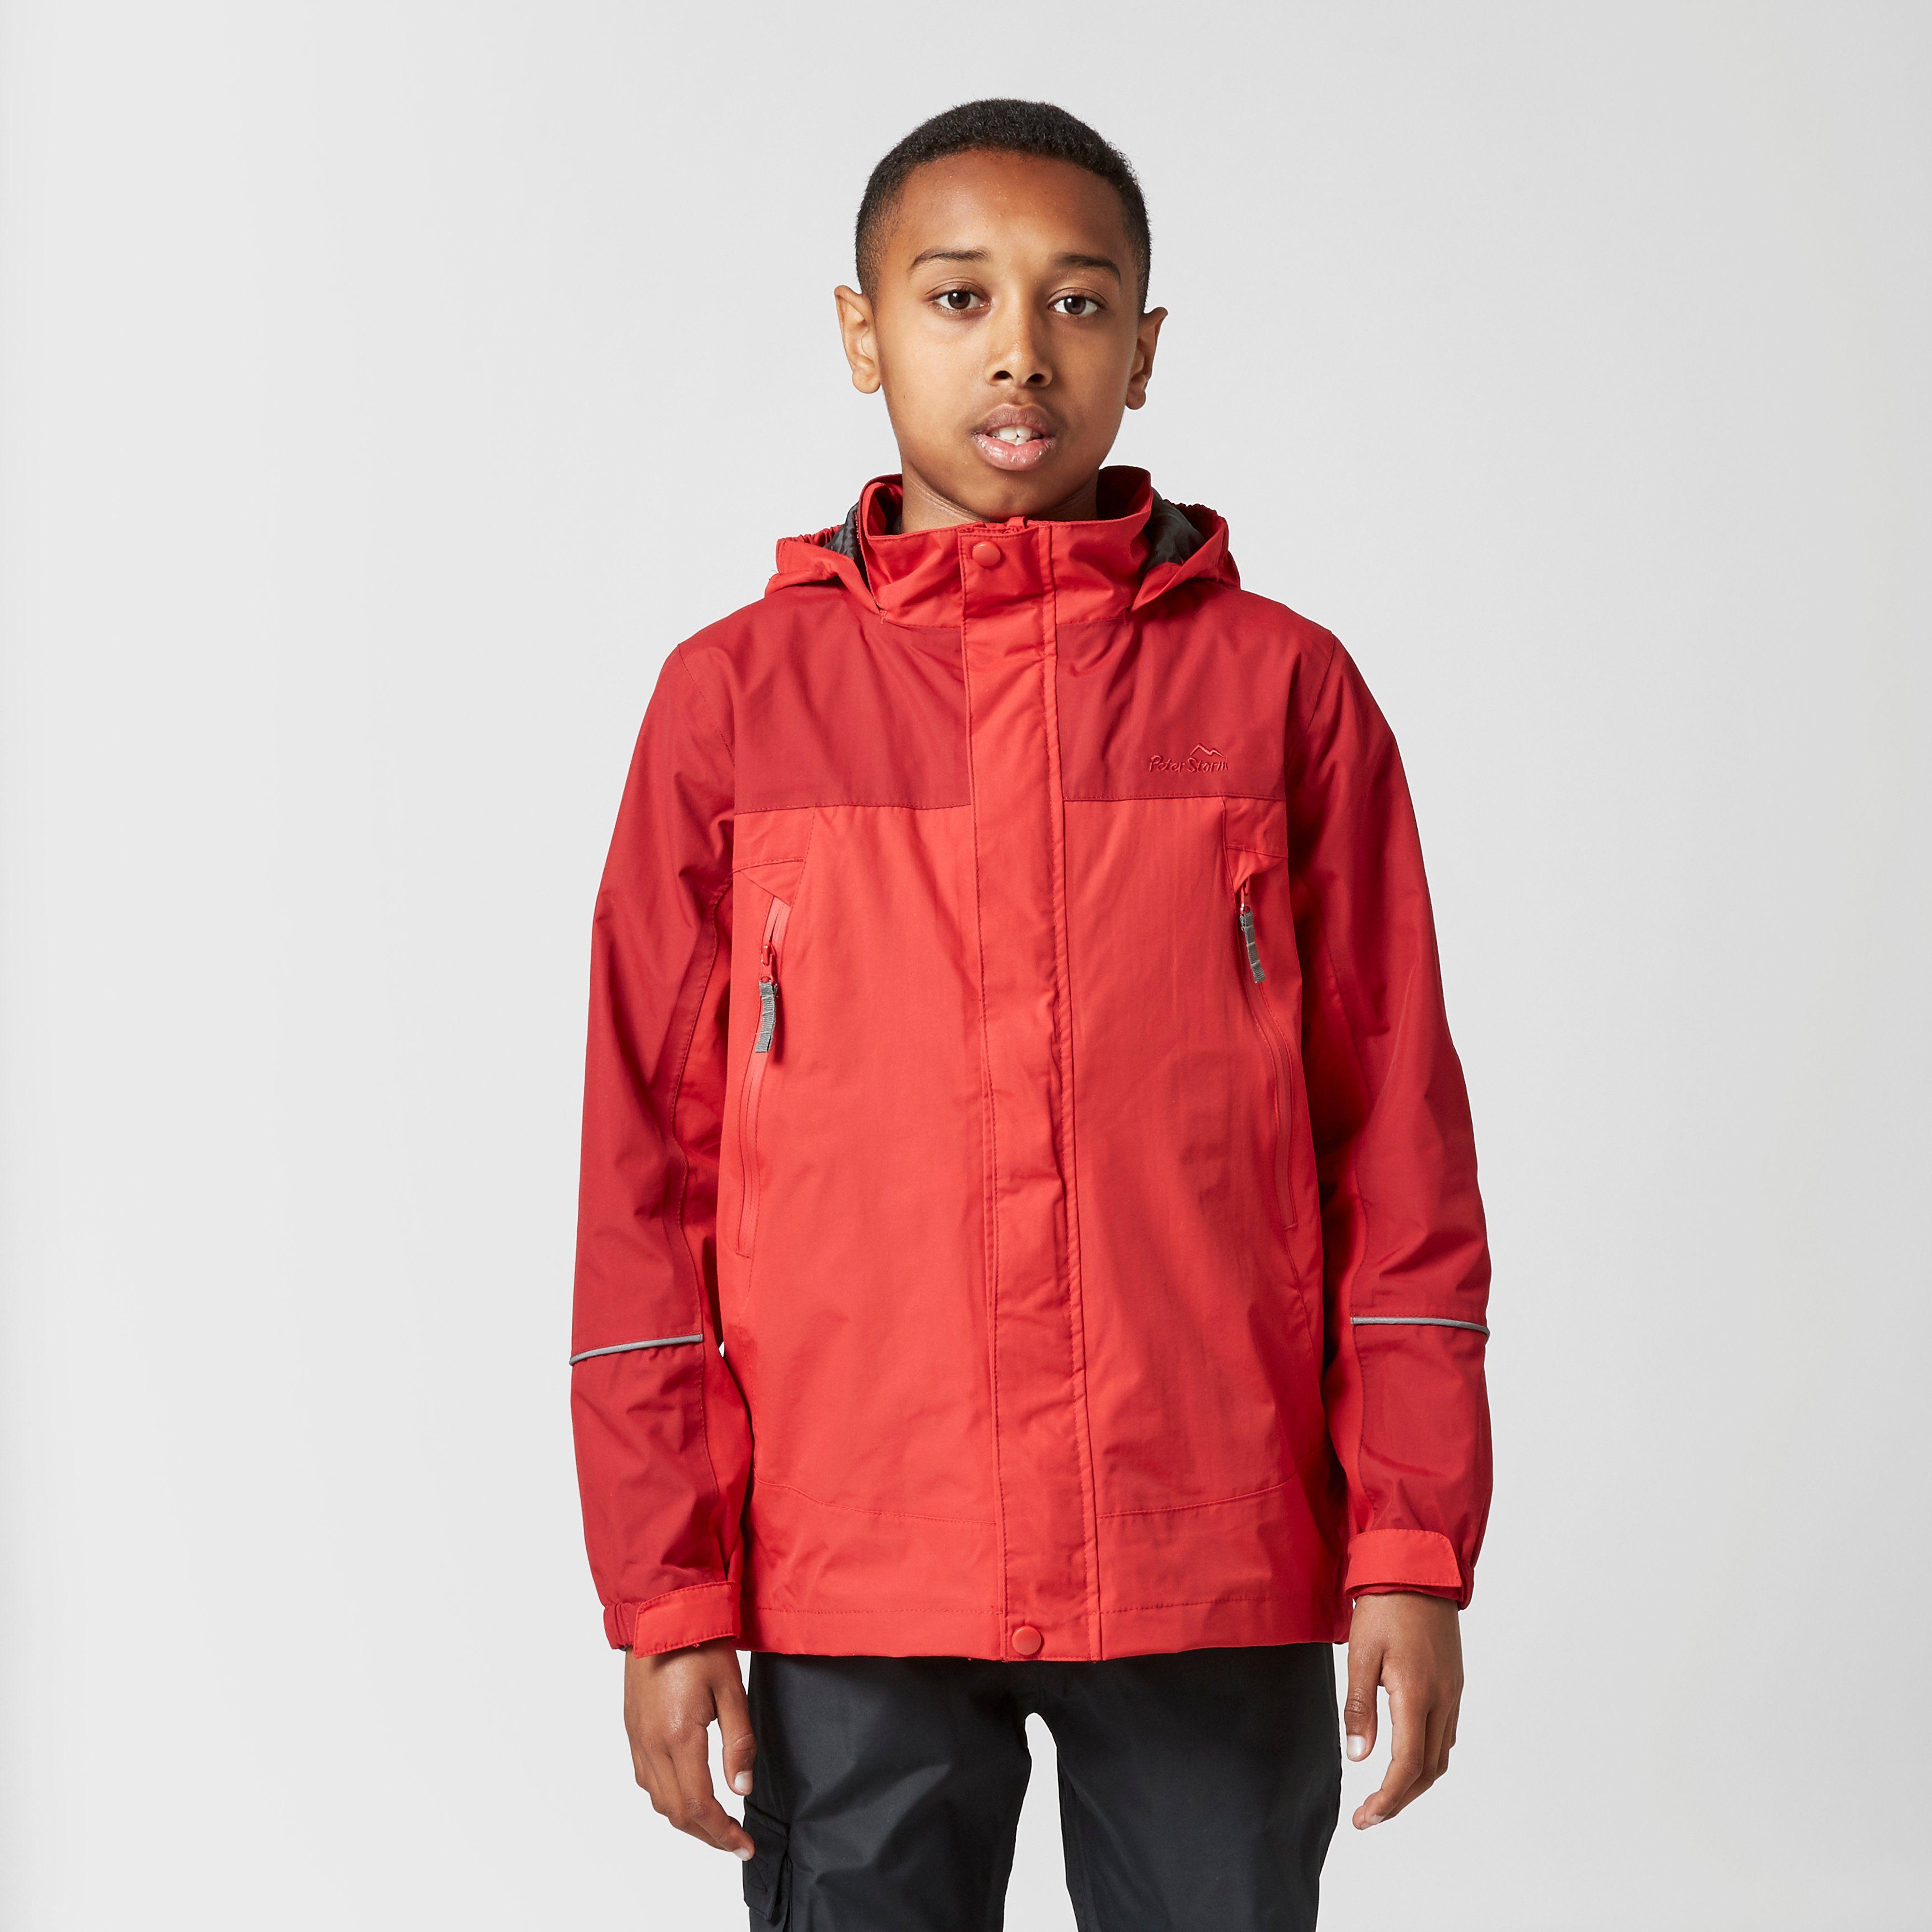 PETER STORM Boy's Mercury Waterproof Jacket